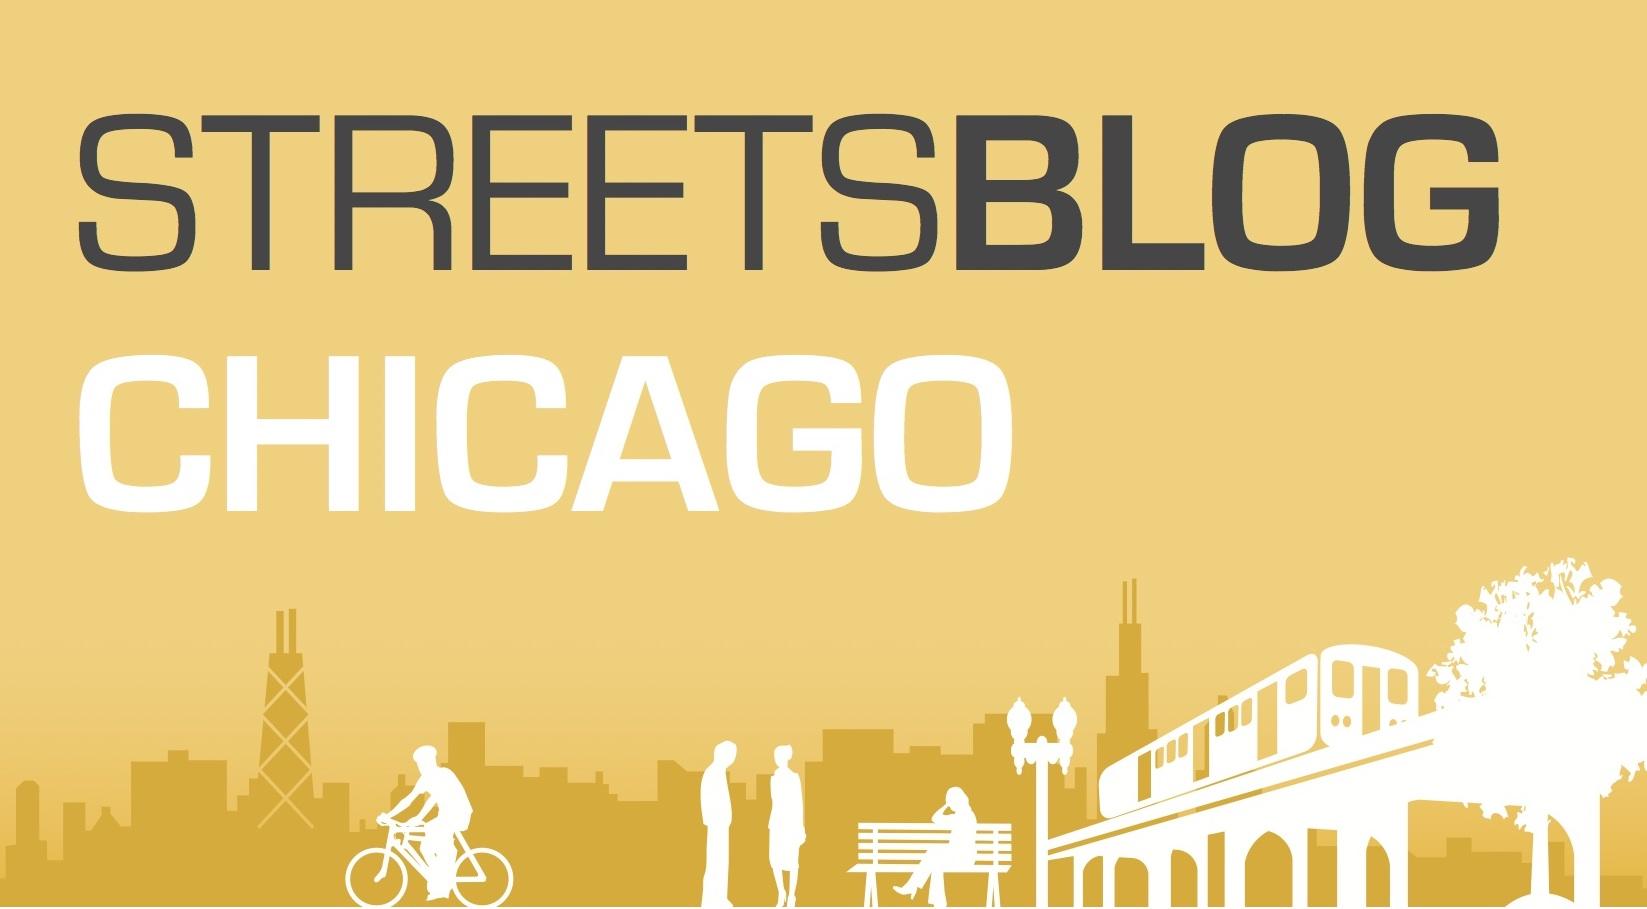 streetsblog chicago 2014 poster 4a